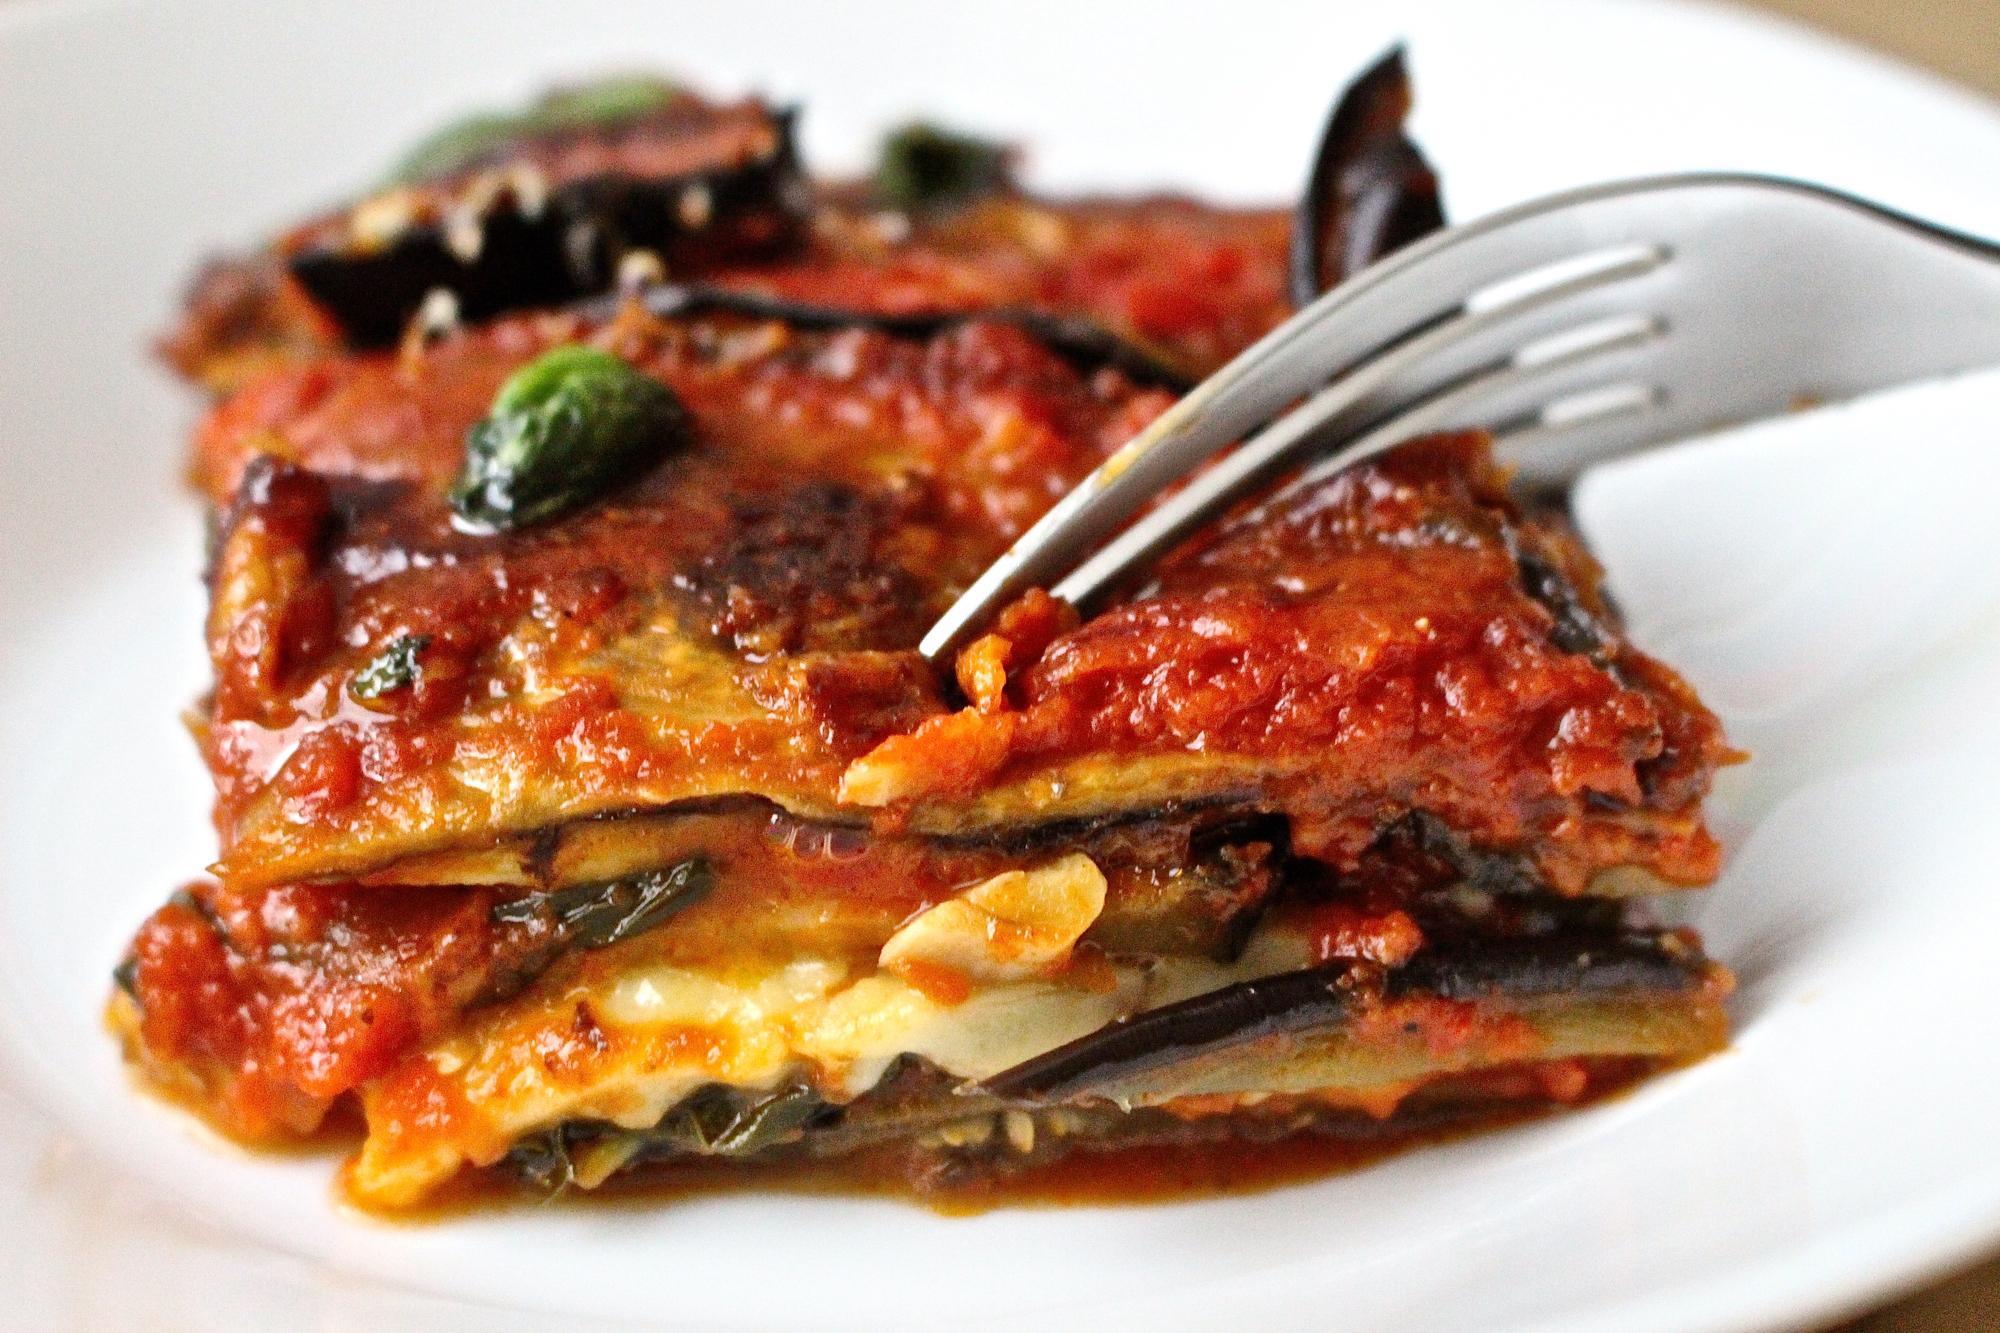 Vegan Eggplant Parm Dish